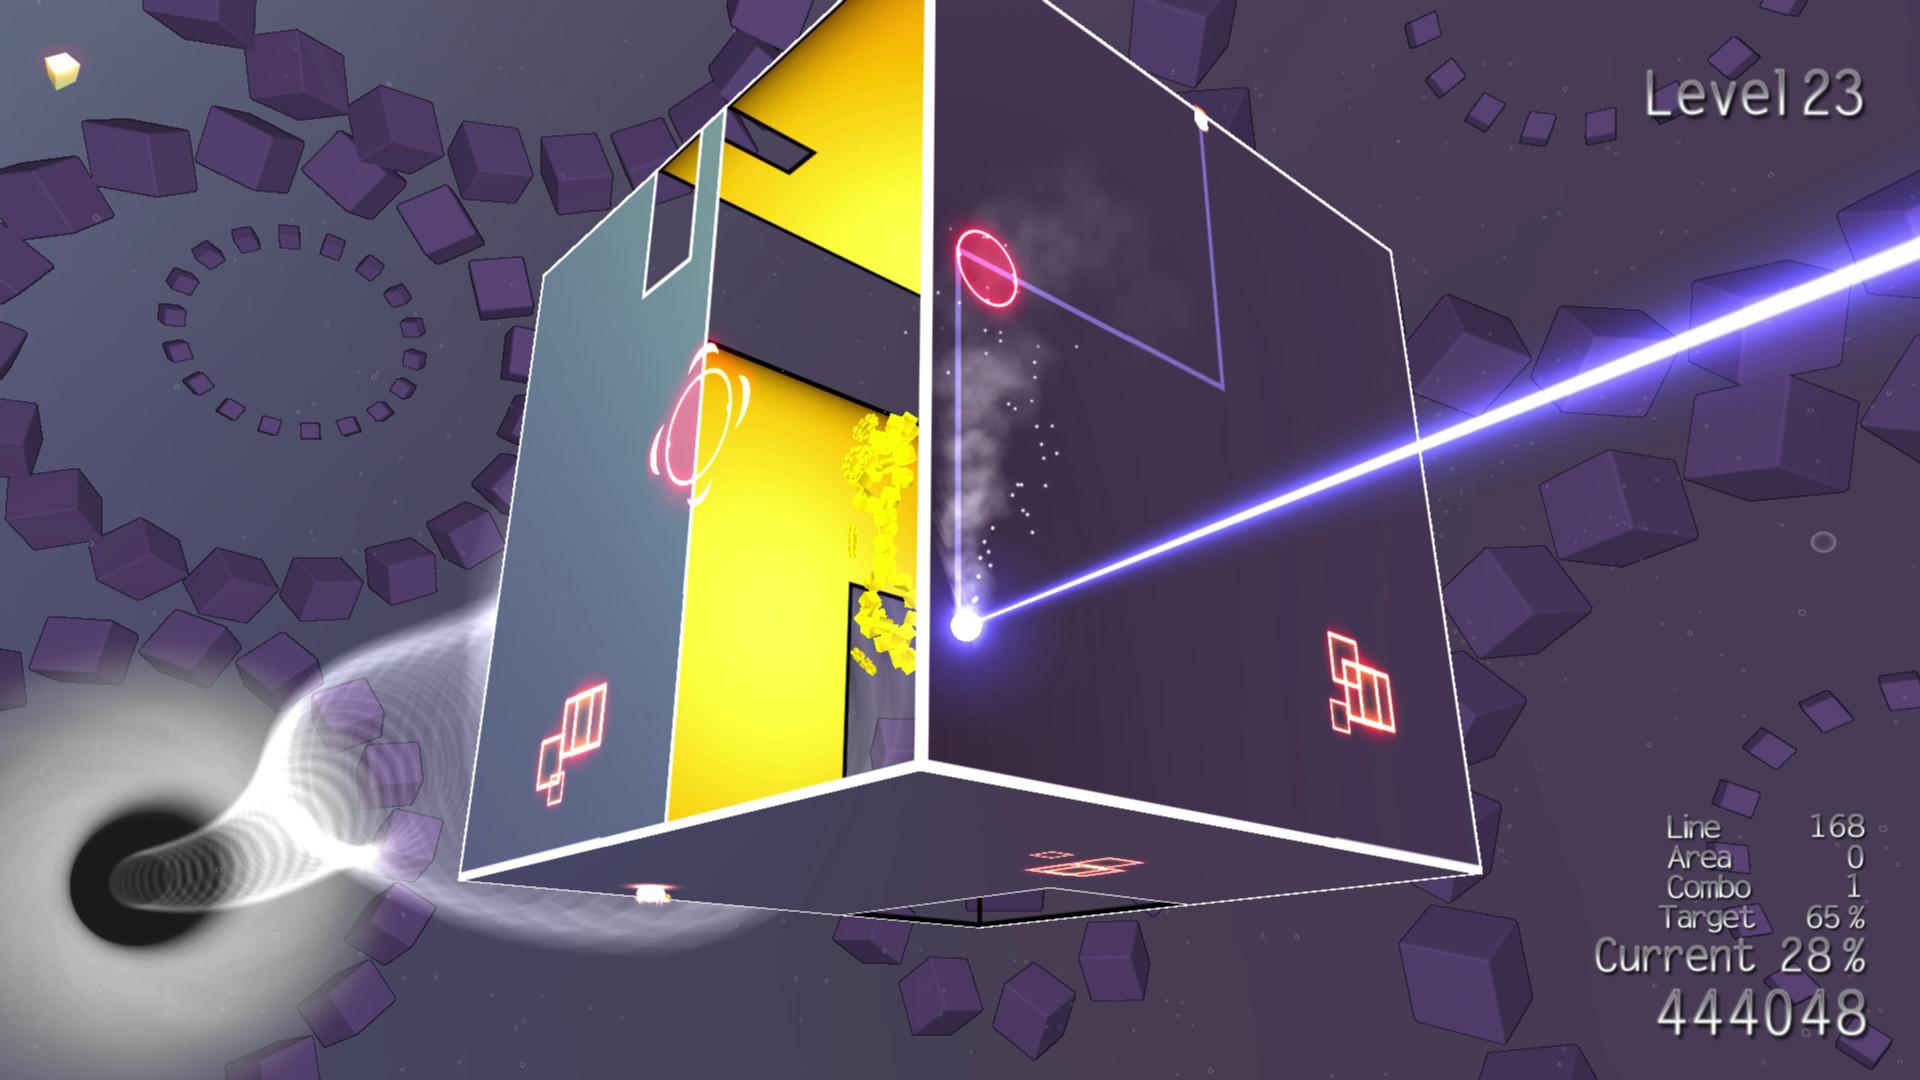 Cubixx HD Review Screenshot 2